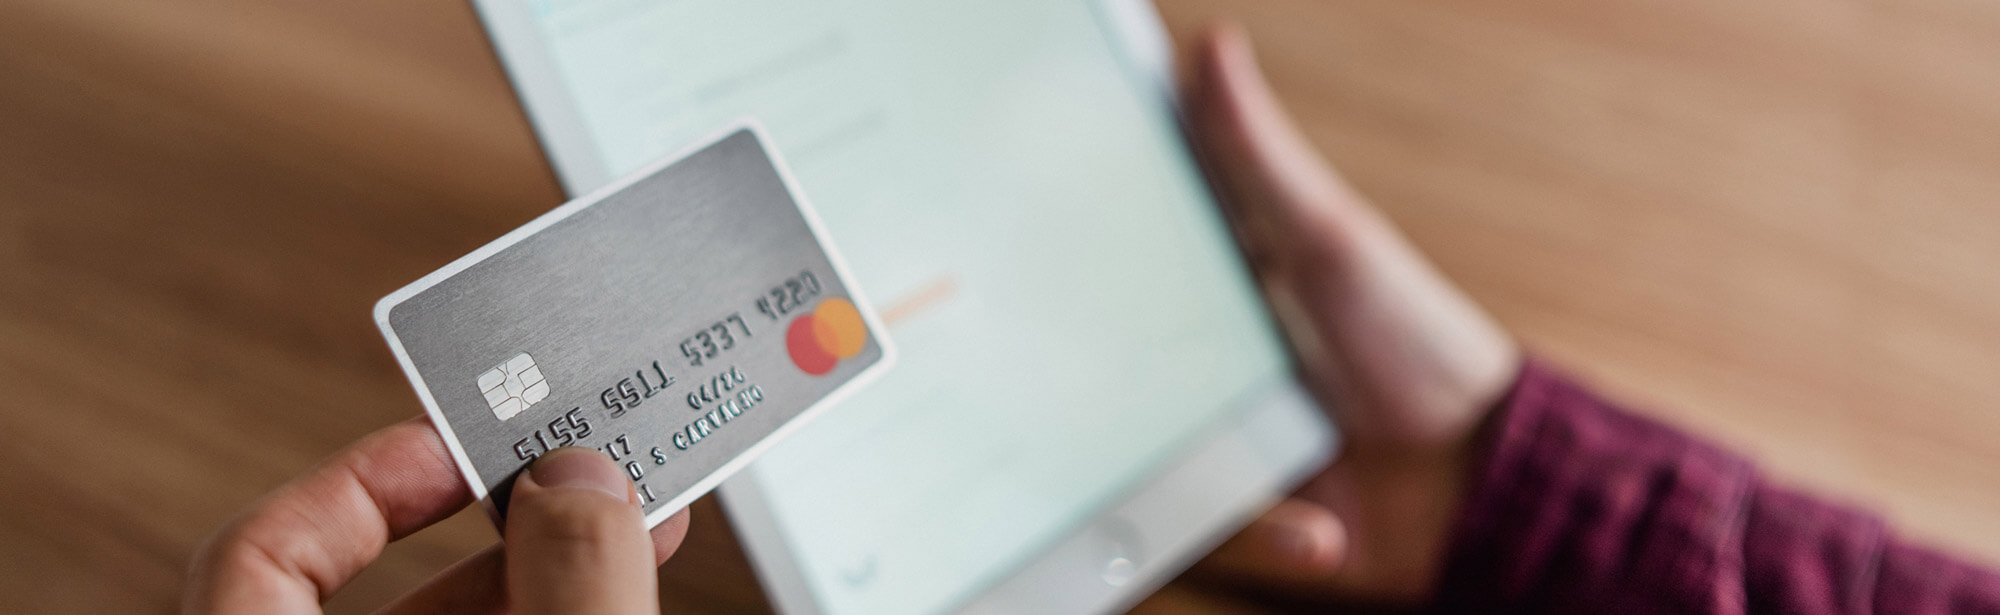 full-credit-cards-02